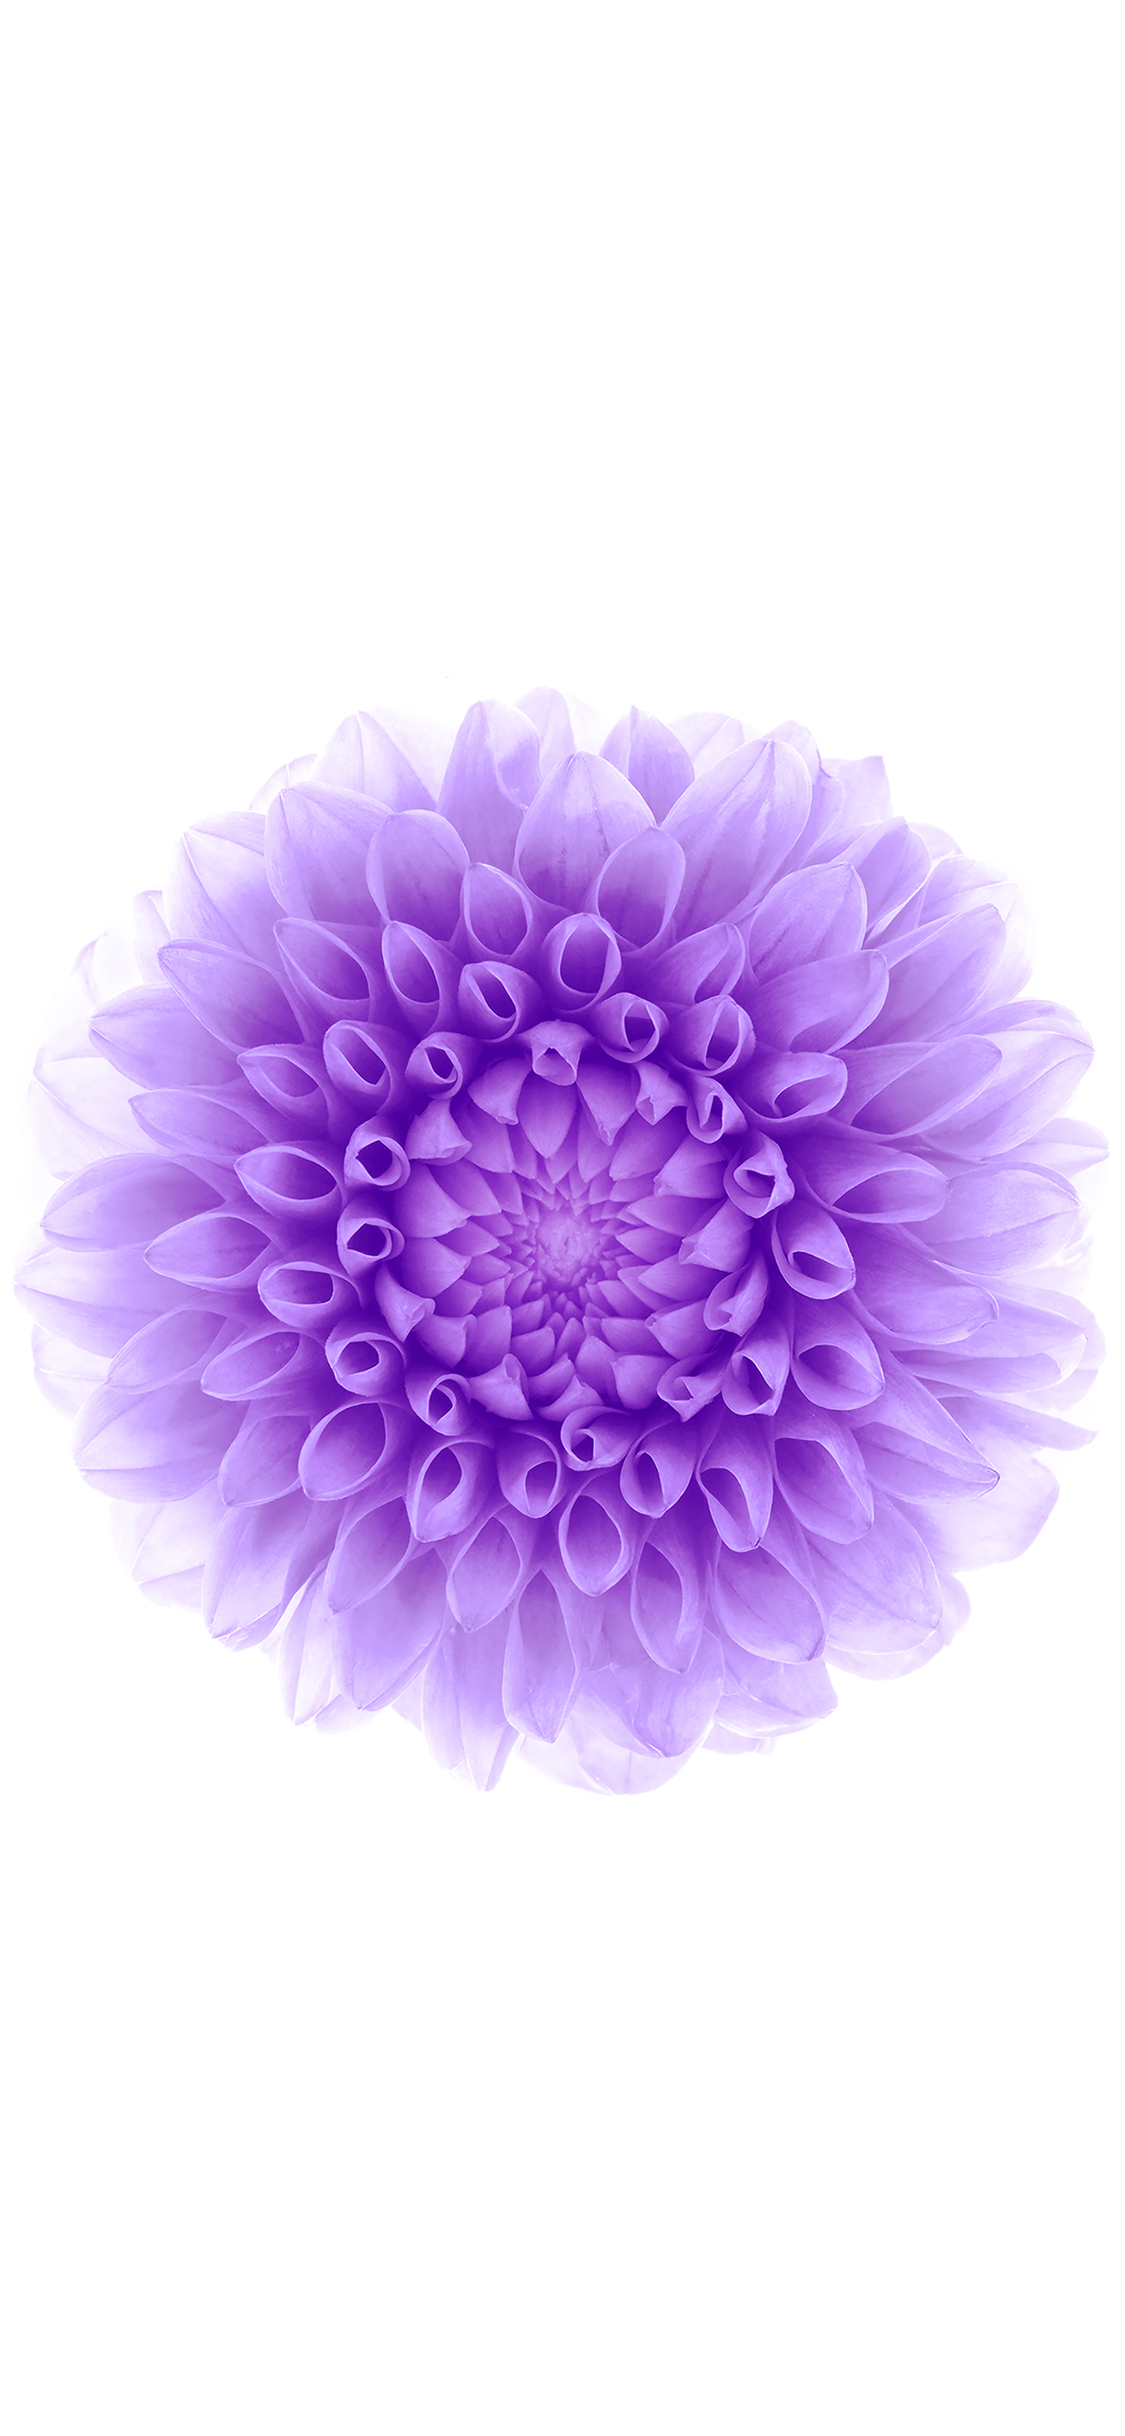 iPhoneXpapers.com-Apple-iPhone-wallpaper-ac95-wallpaper-apple-iphone6-plus-ios8-flower-purple